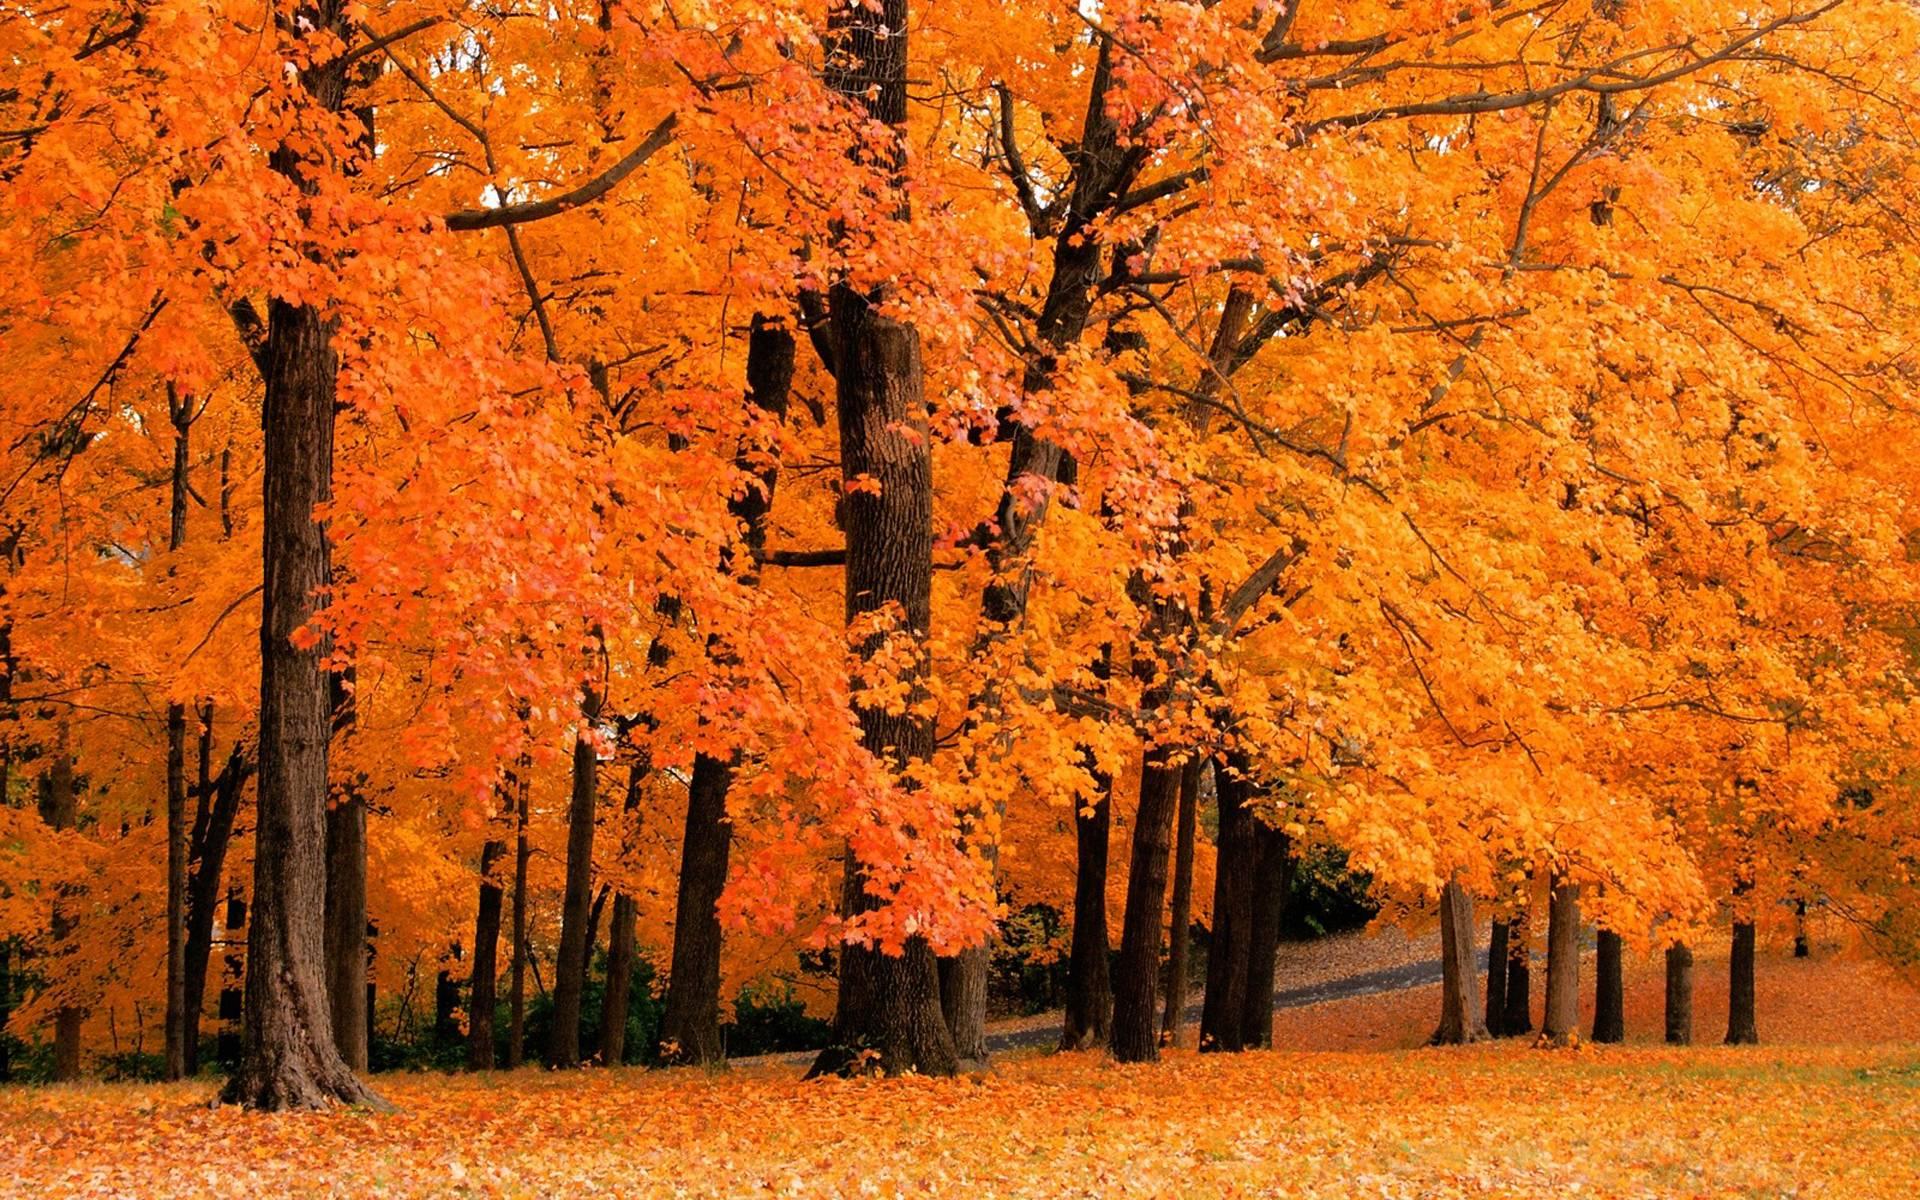 desktop wallpaper fall autumn   wwwwallpapers in hdcom 1920x1200